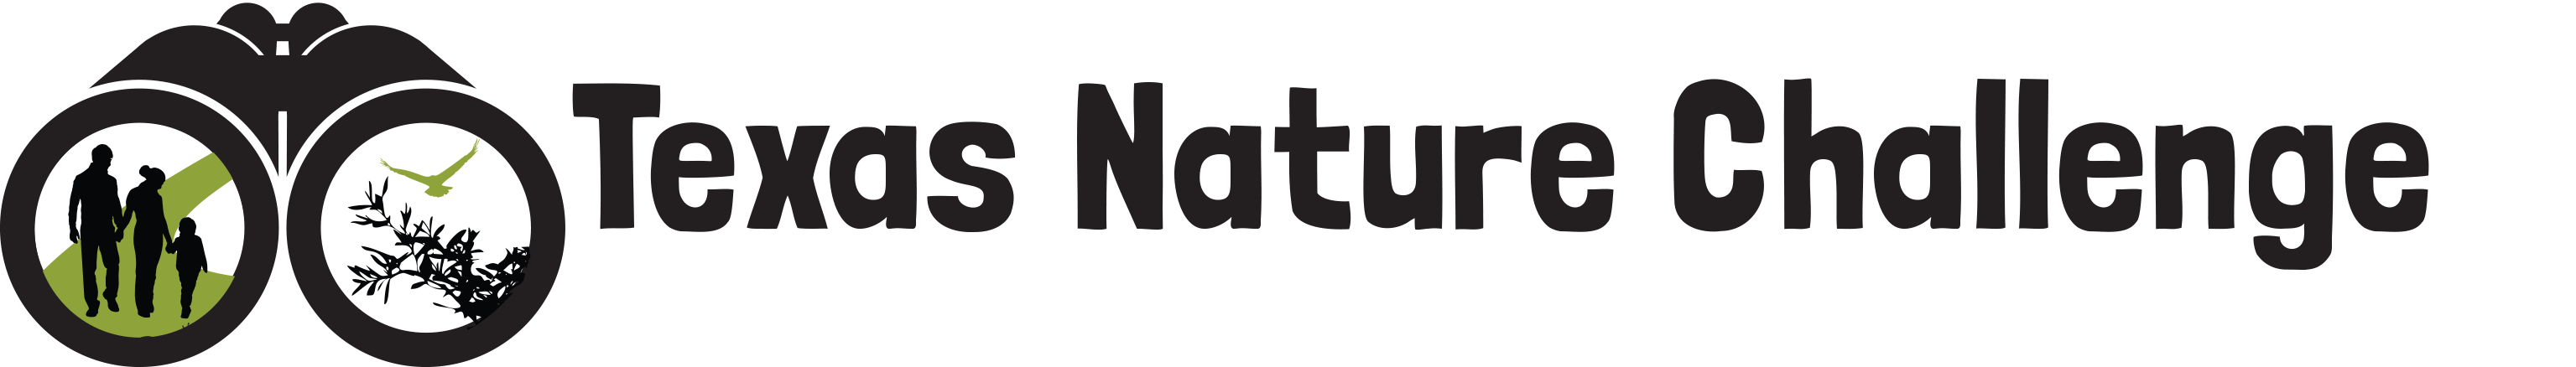 Texas Nature Challenge